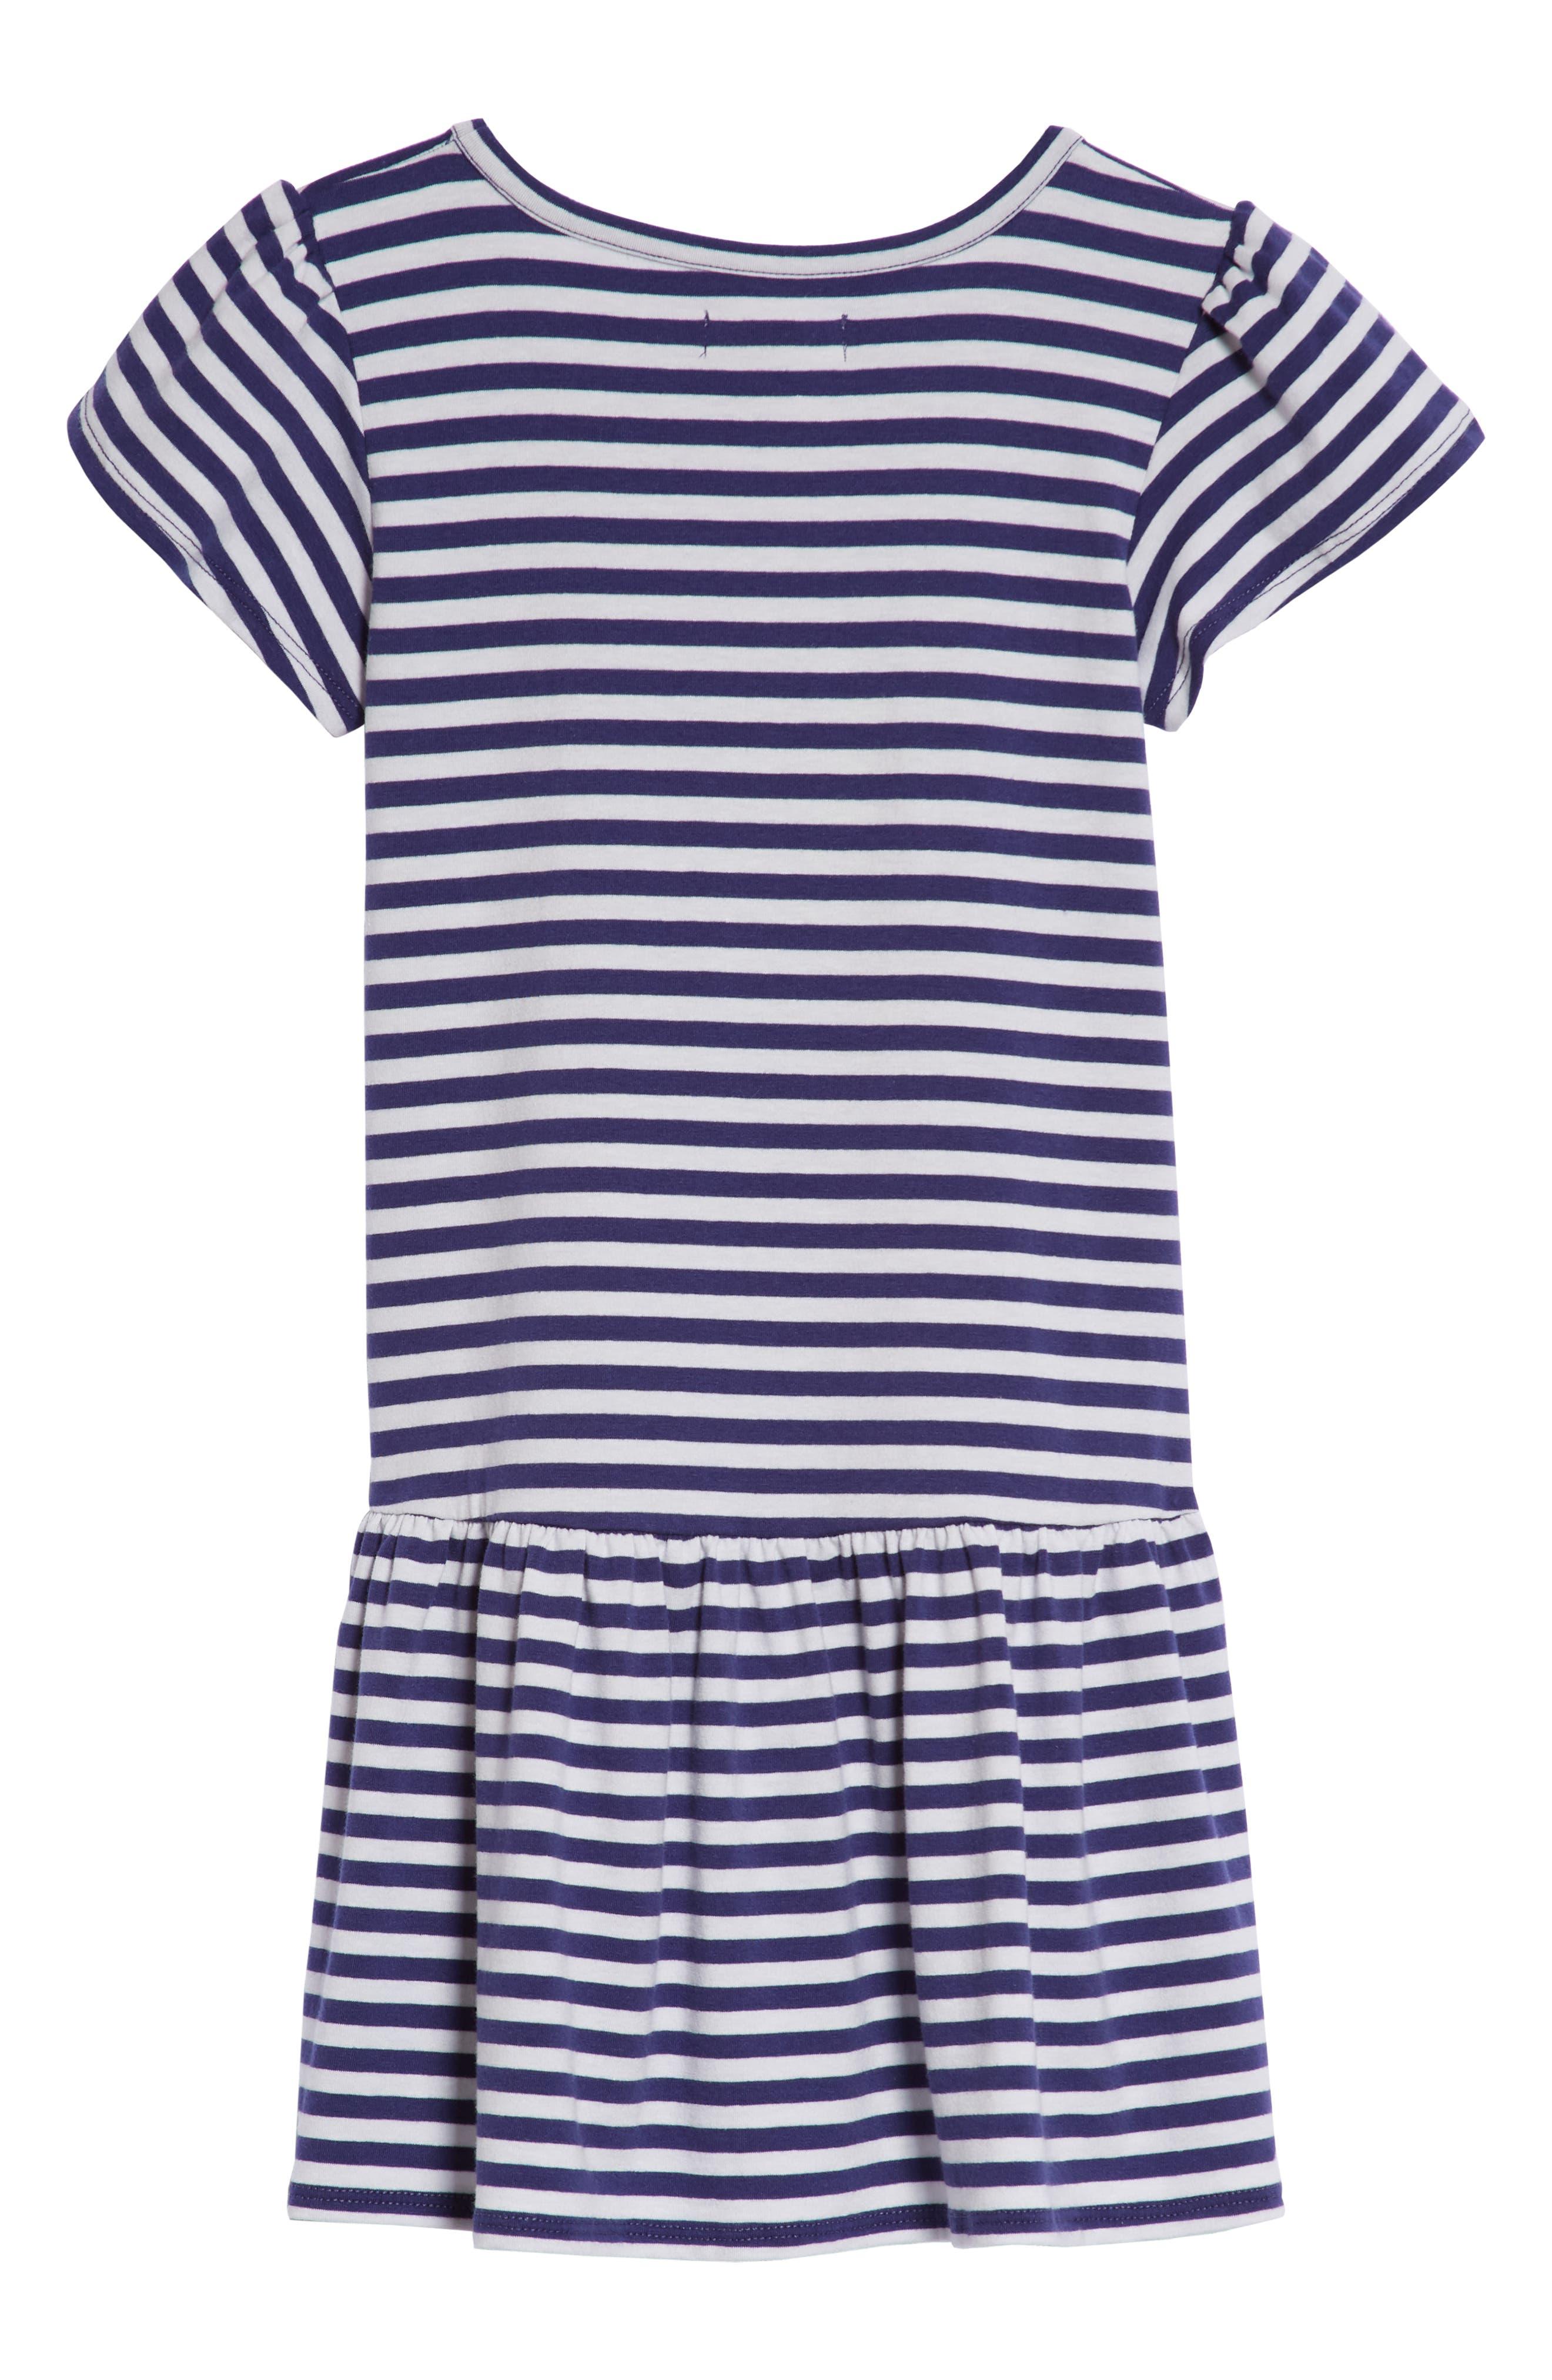 Graphic Stripe Dress,                             Alternate thumbnail 2, color,                             Navy Ribbon Sparkle Heart